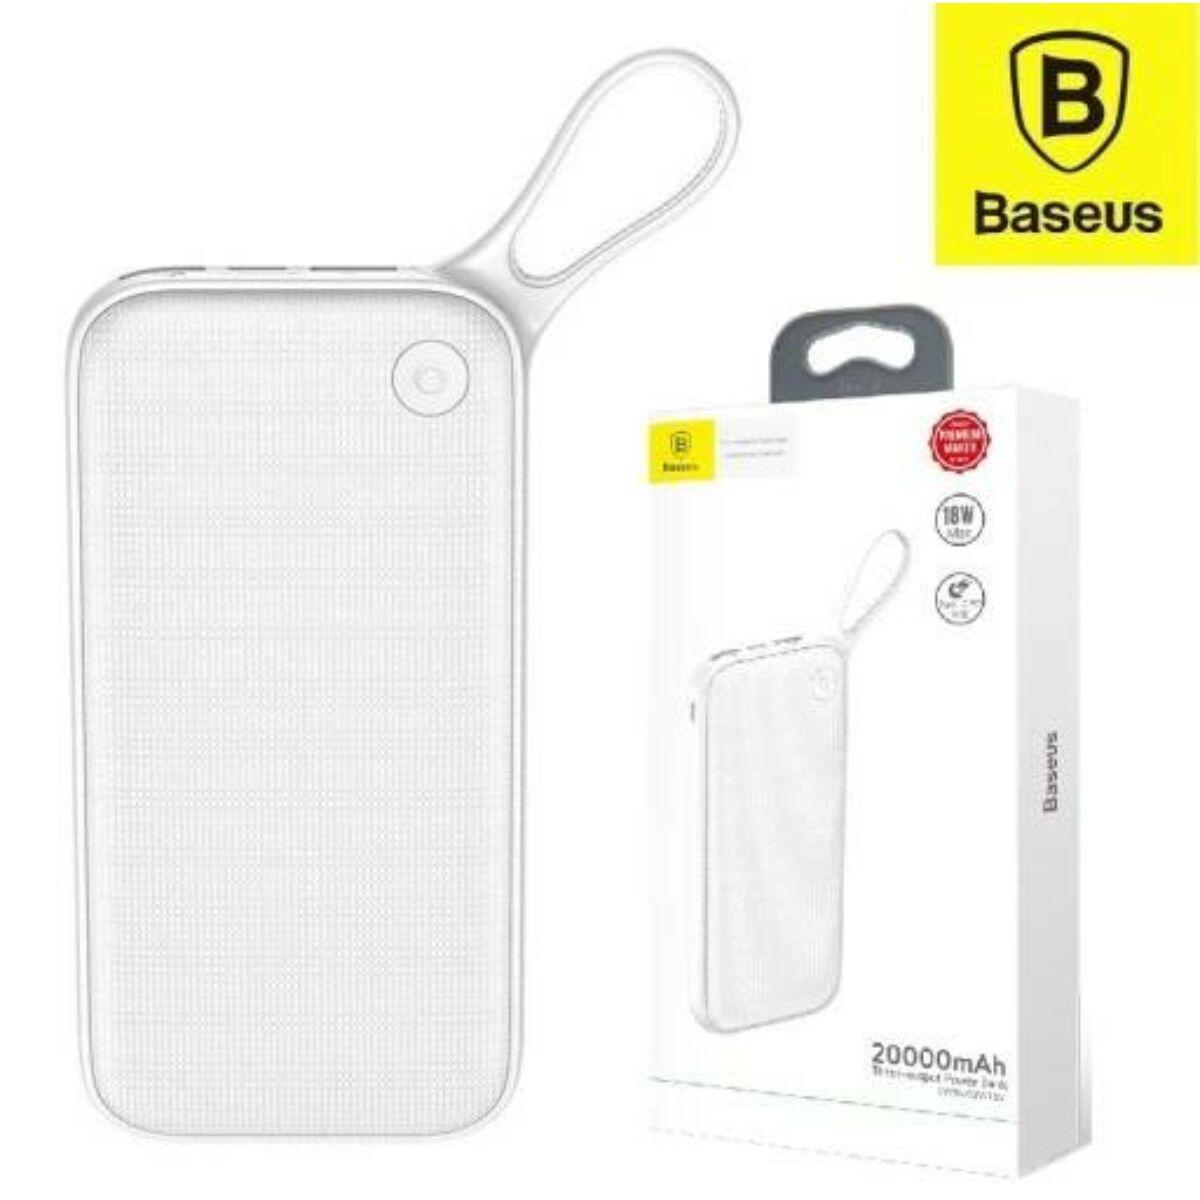 Baseus Power Bank Powerful (Micro USB + Type-C bemenet / dupla USB + Type-C PD kimenet), 2.4A, 20.000 mAh, fehér (PPKC-A02)